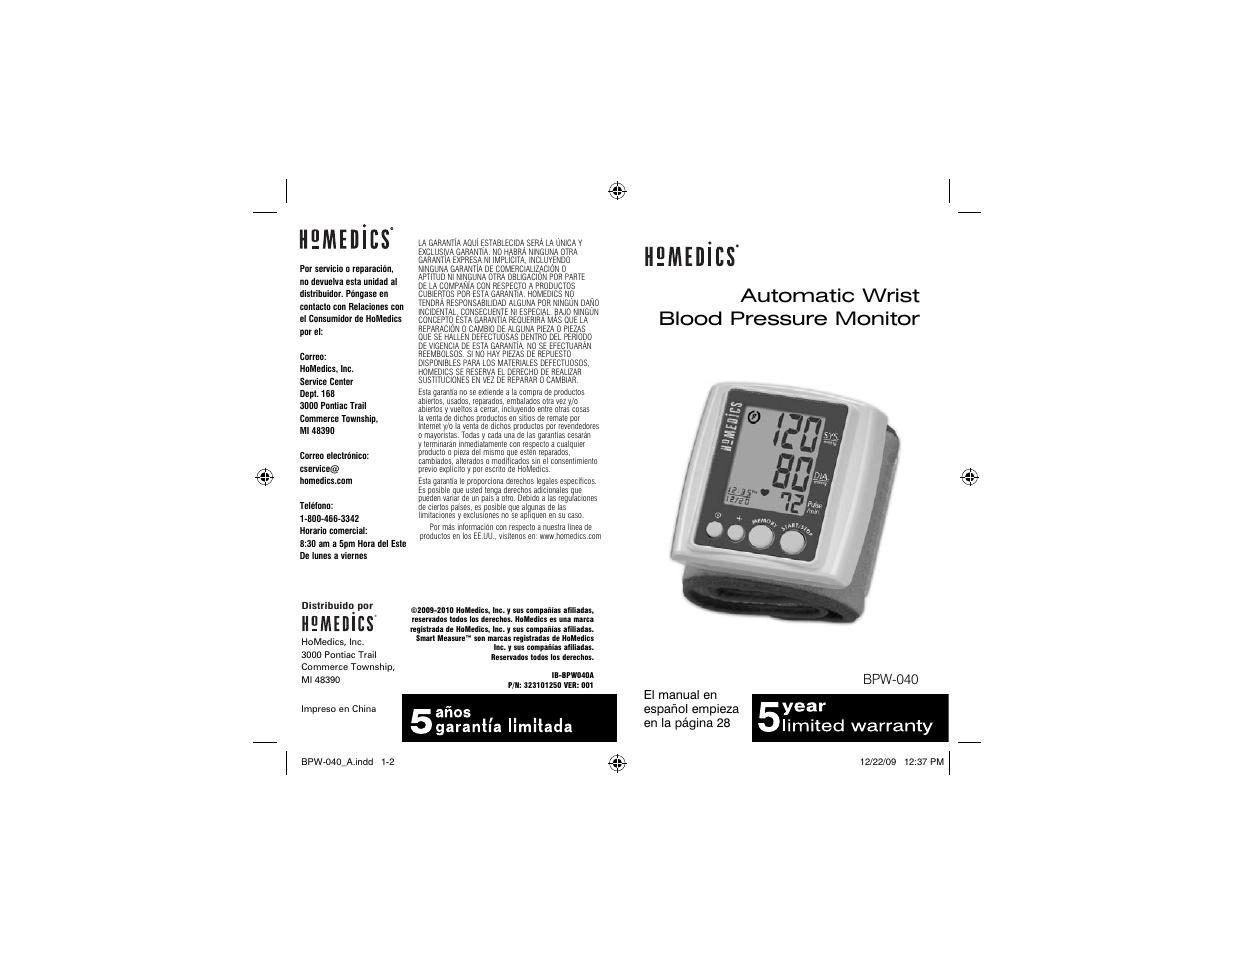 Homedics Blood Pressure Monitor User Manual